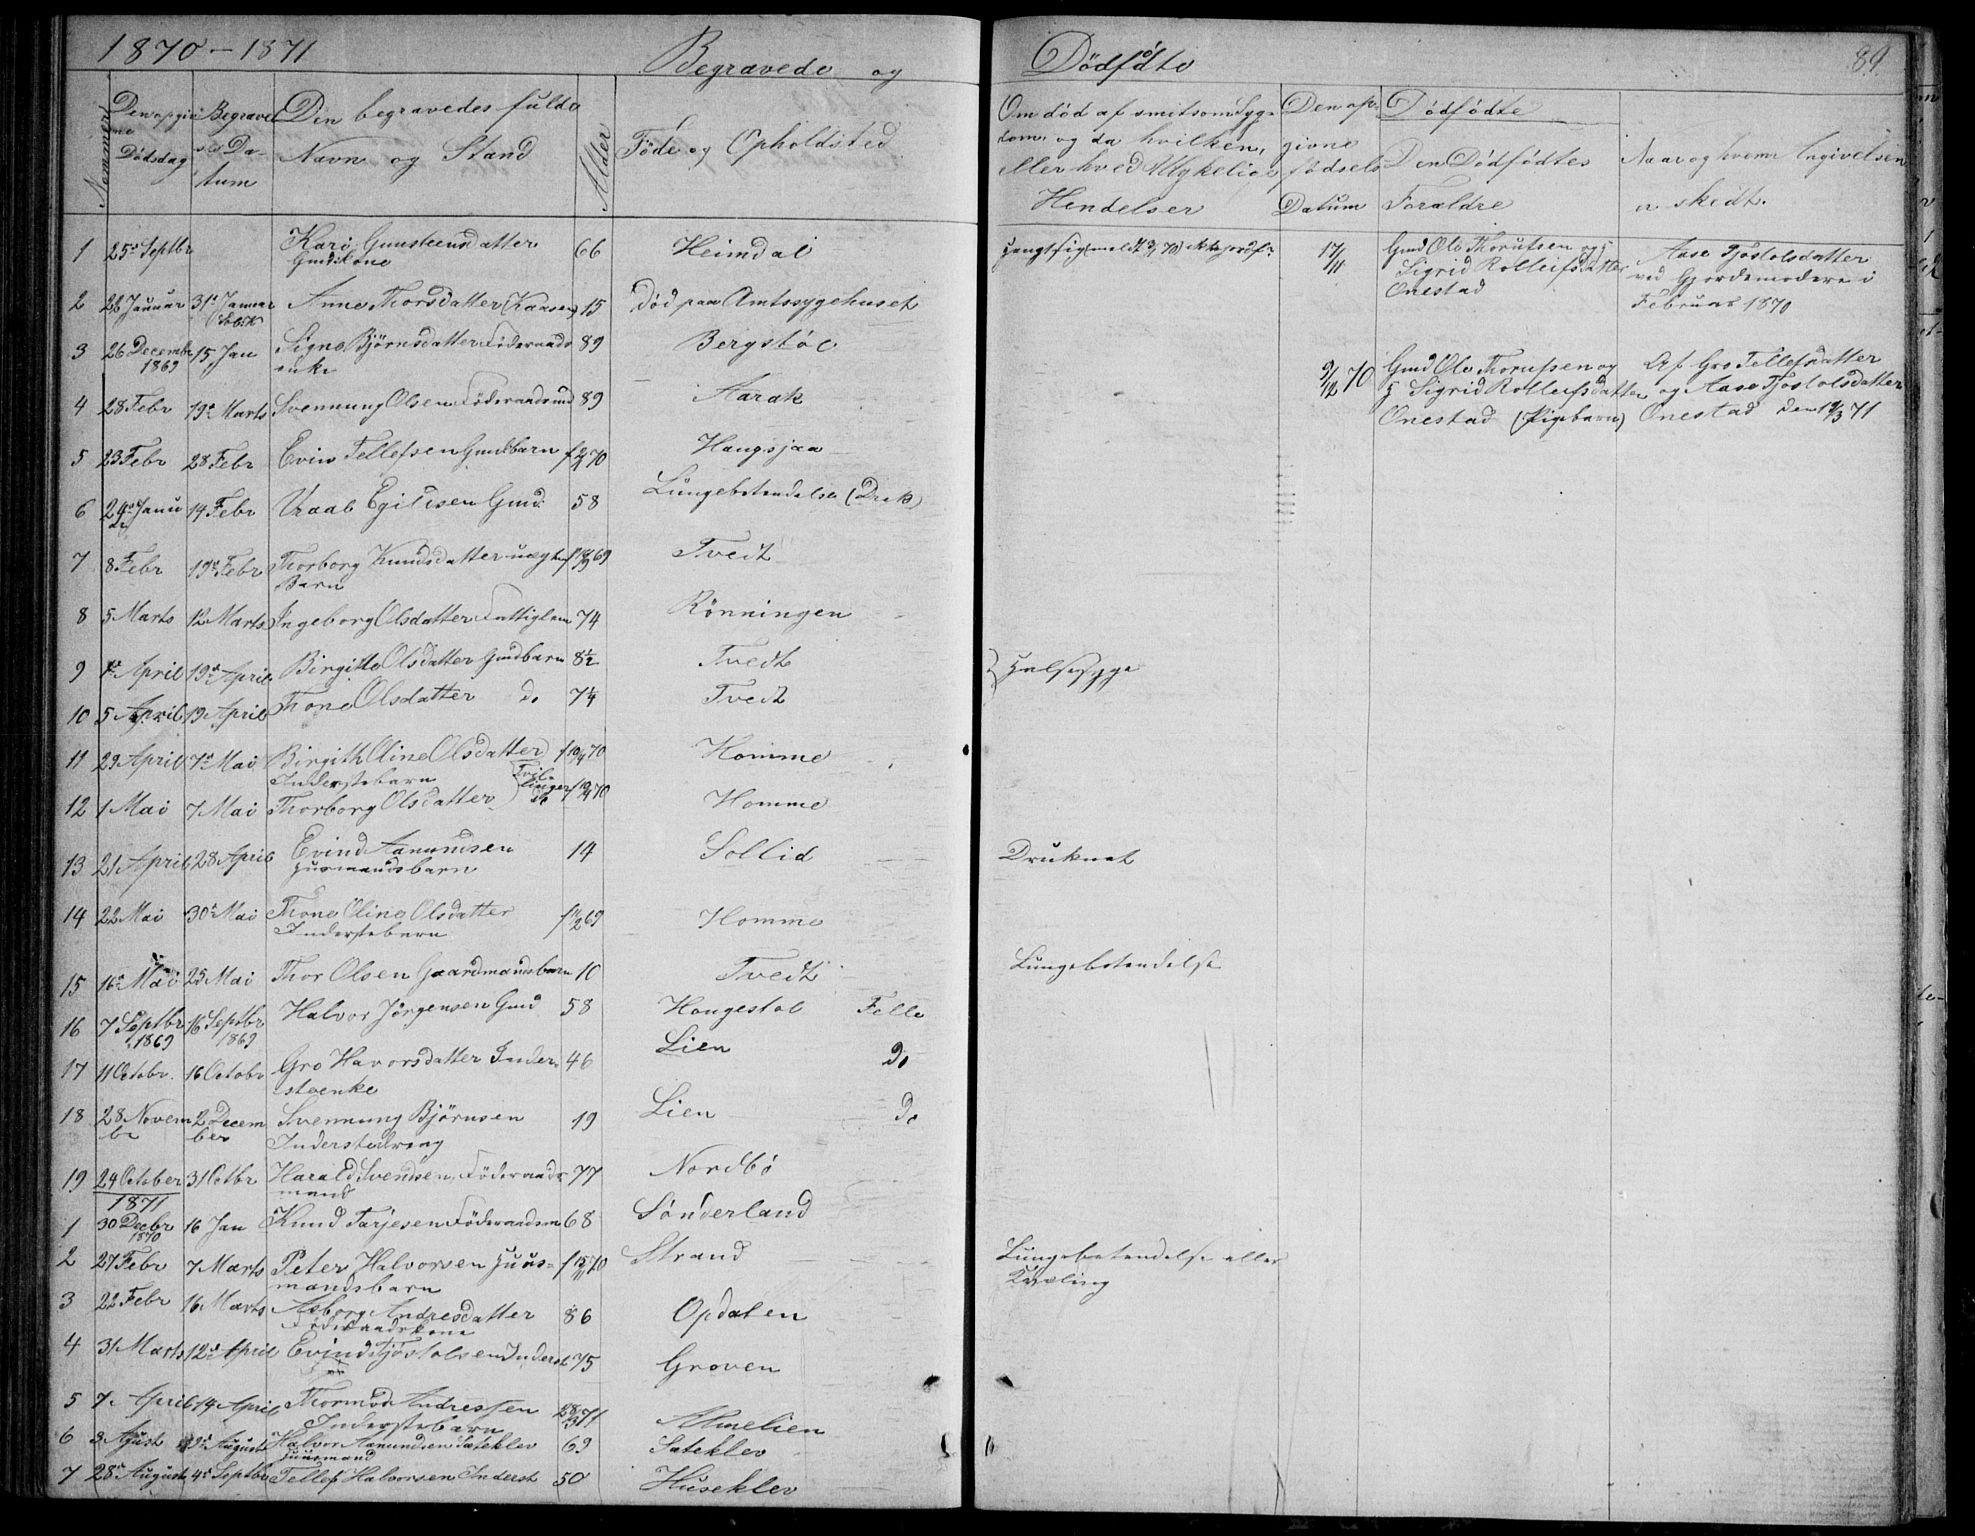 SAKO, Nissedal kirkebøker, G/Gb/L0002: Klokkerbok nr. II 2, 1863-1892, s. 89